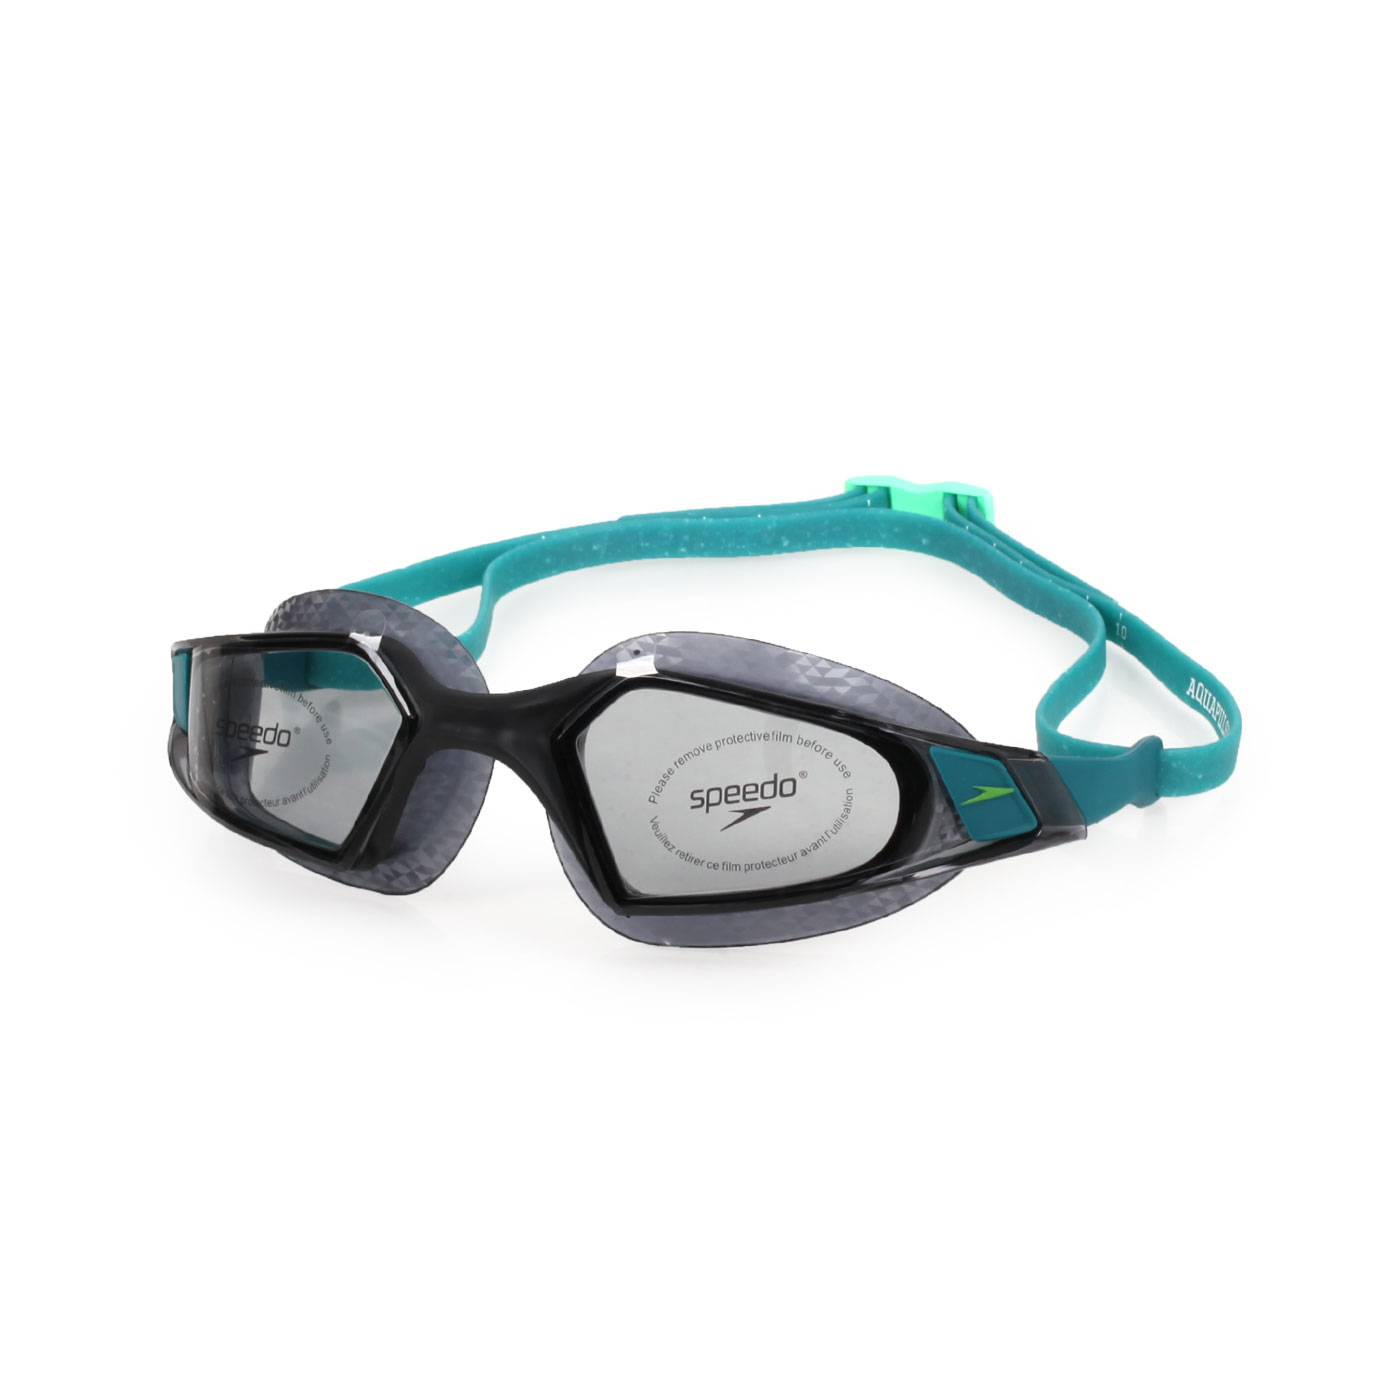 SPEEDO 成人運動泳鏡 Aquapulse Pro SD812266D640 - 黑湖水藍